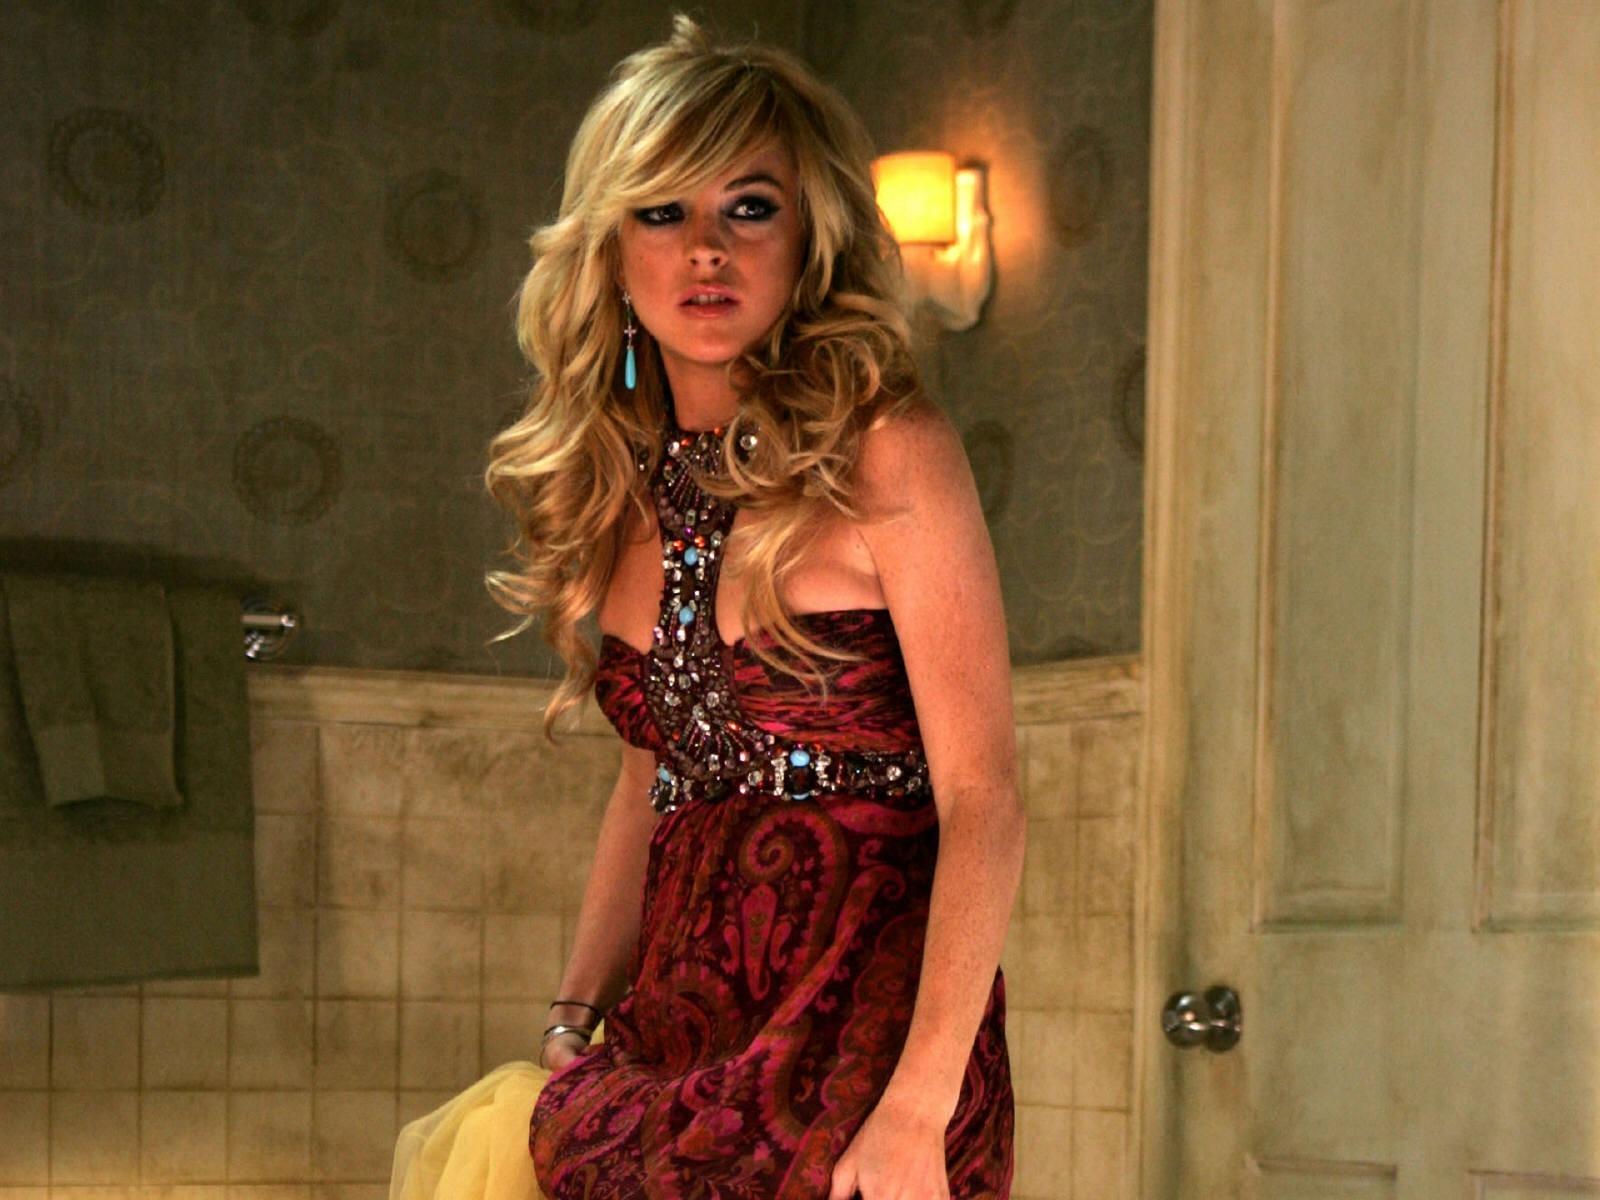 Wallpaper di Lindsay Lohan in versione misteriosa